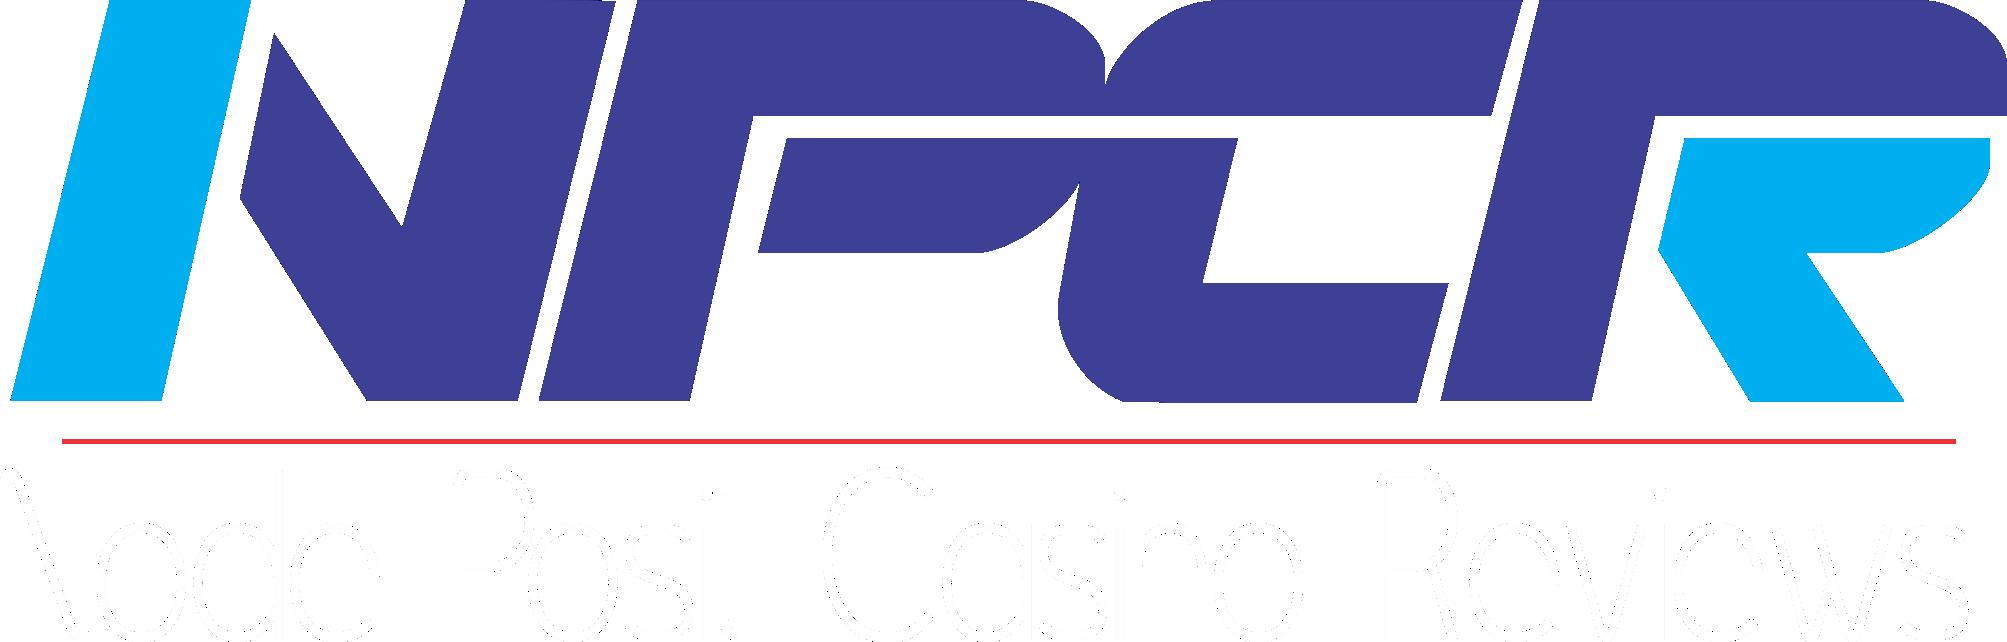 Node Posit Casino Reviews